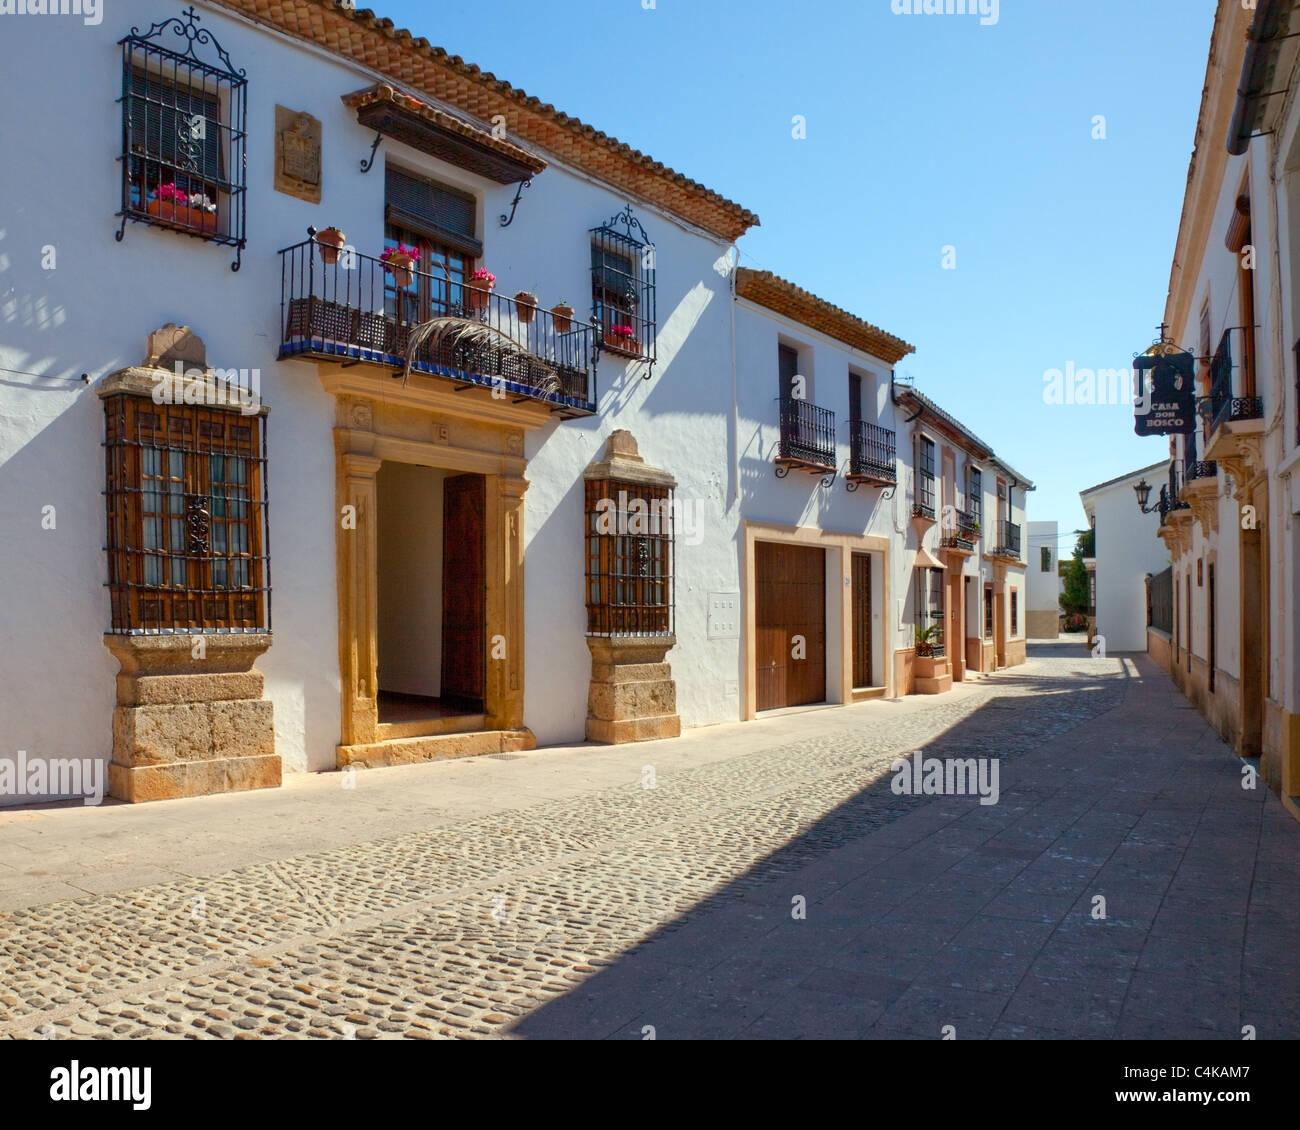 ES - Andalucía: la histórica Ronda Imagen De Stock